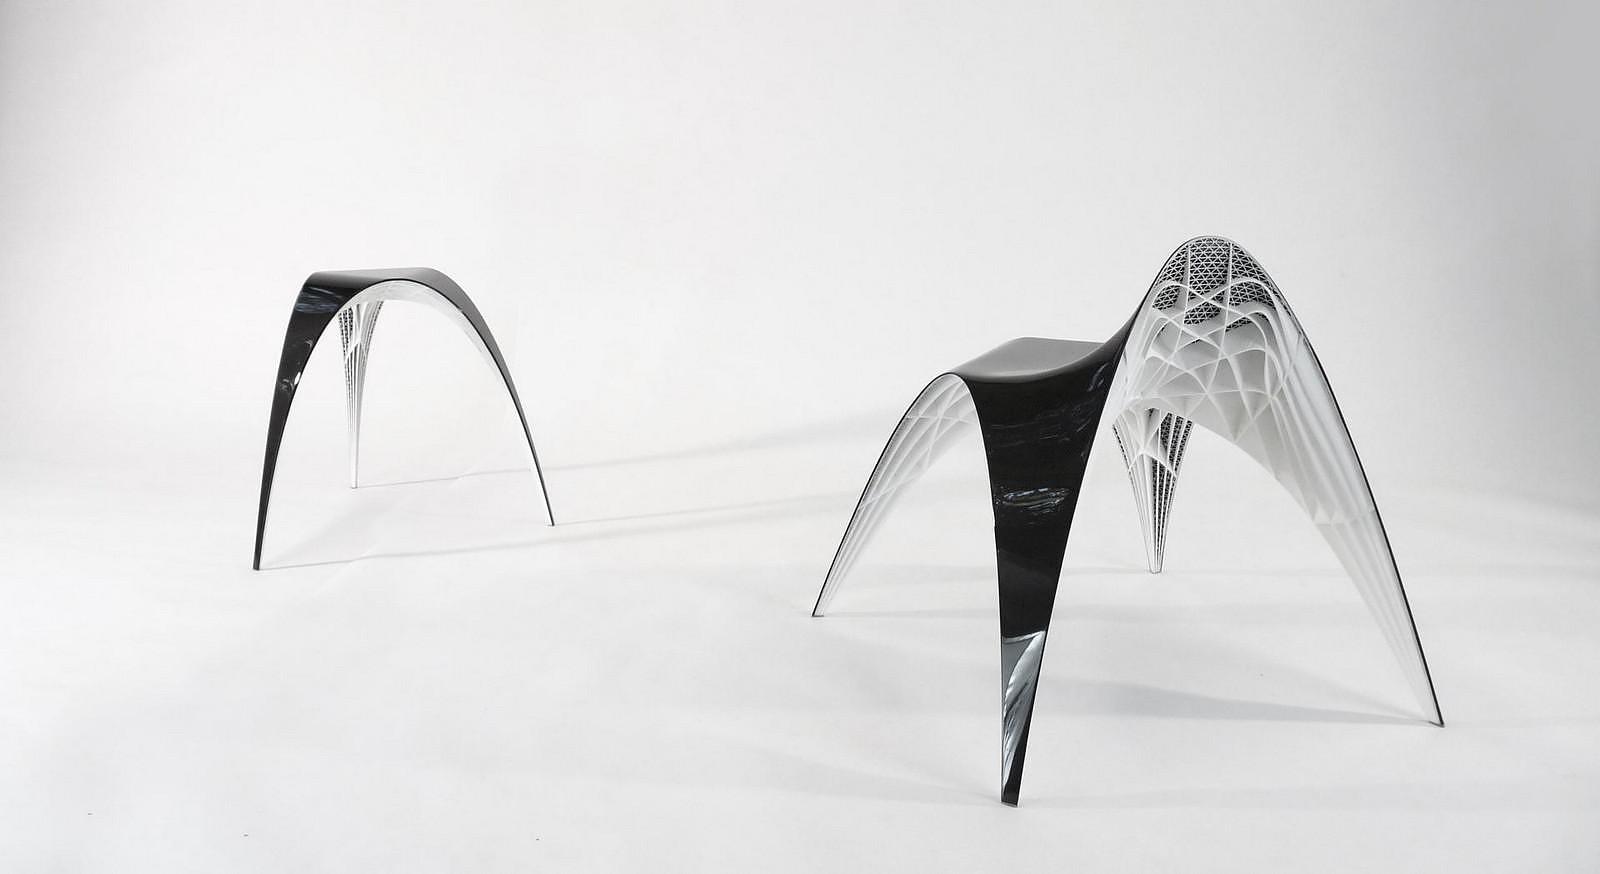 3d Printed Gaudi Chair By Bram Geenen Design Is This